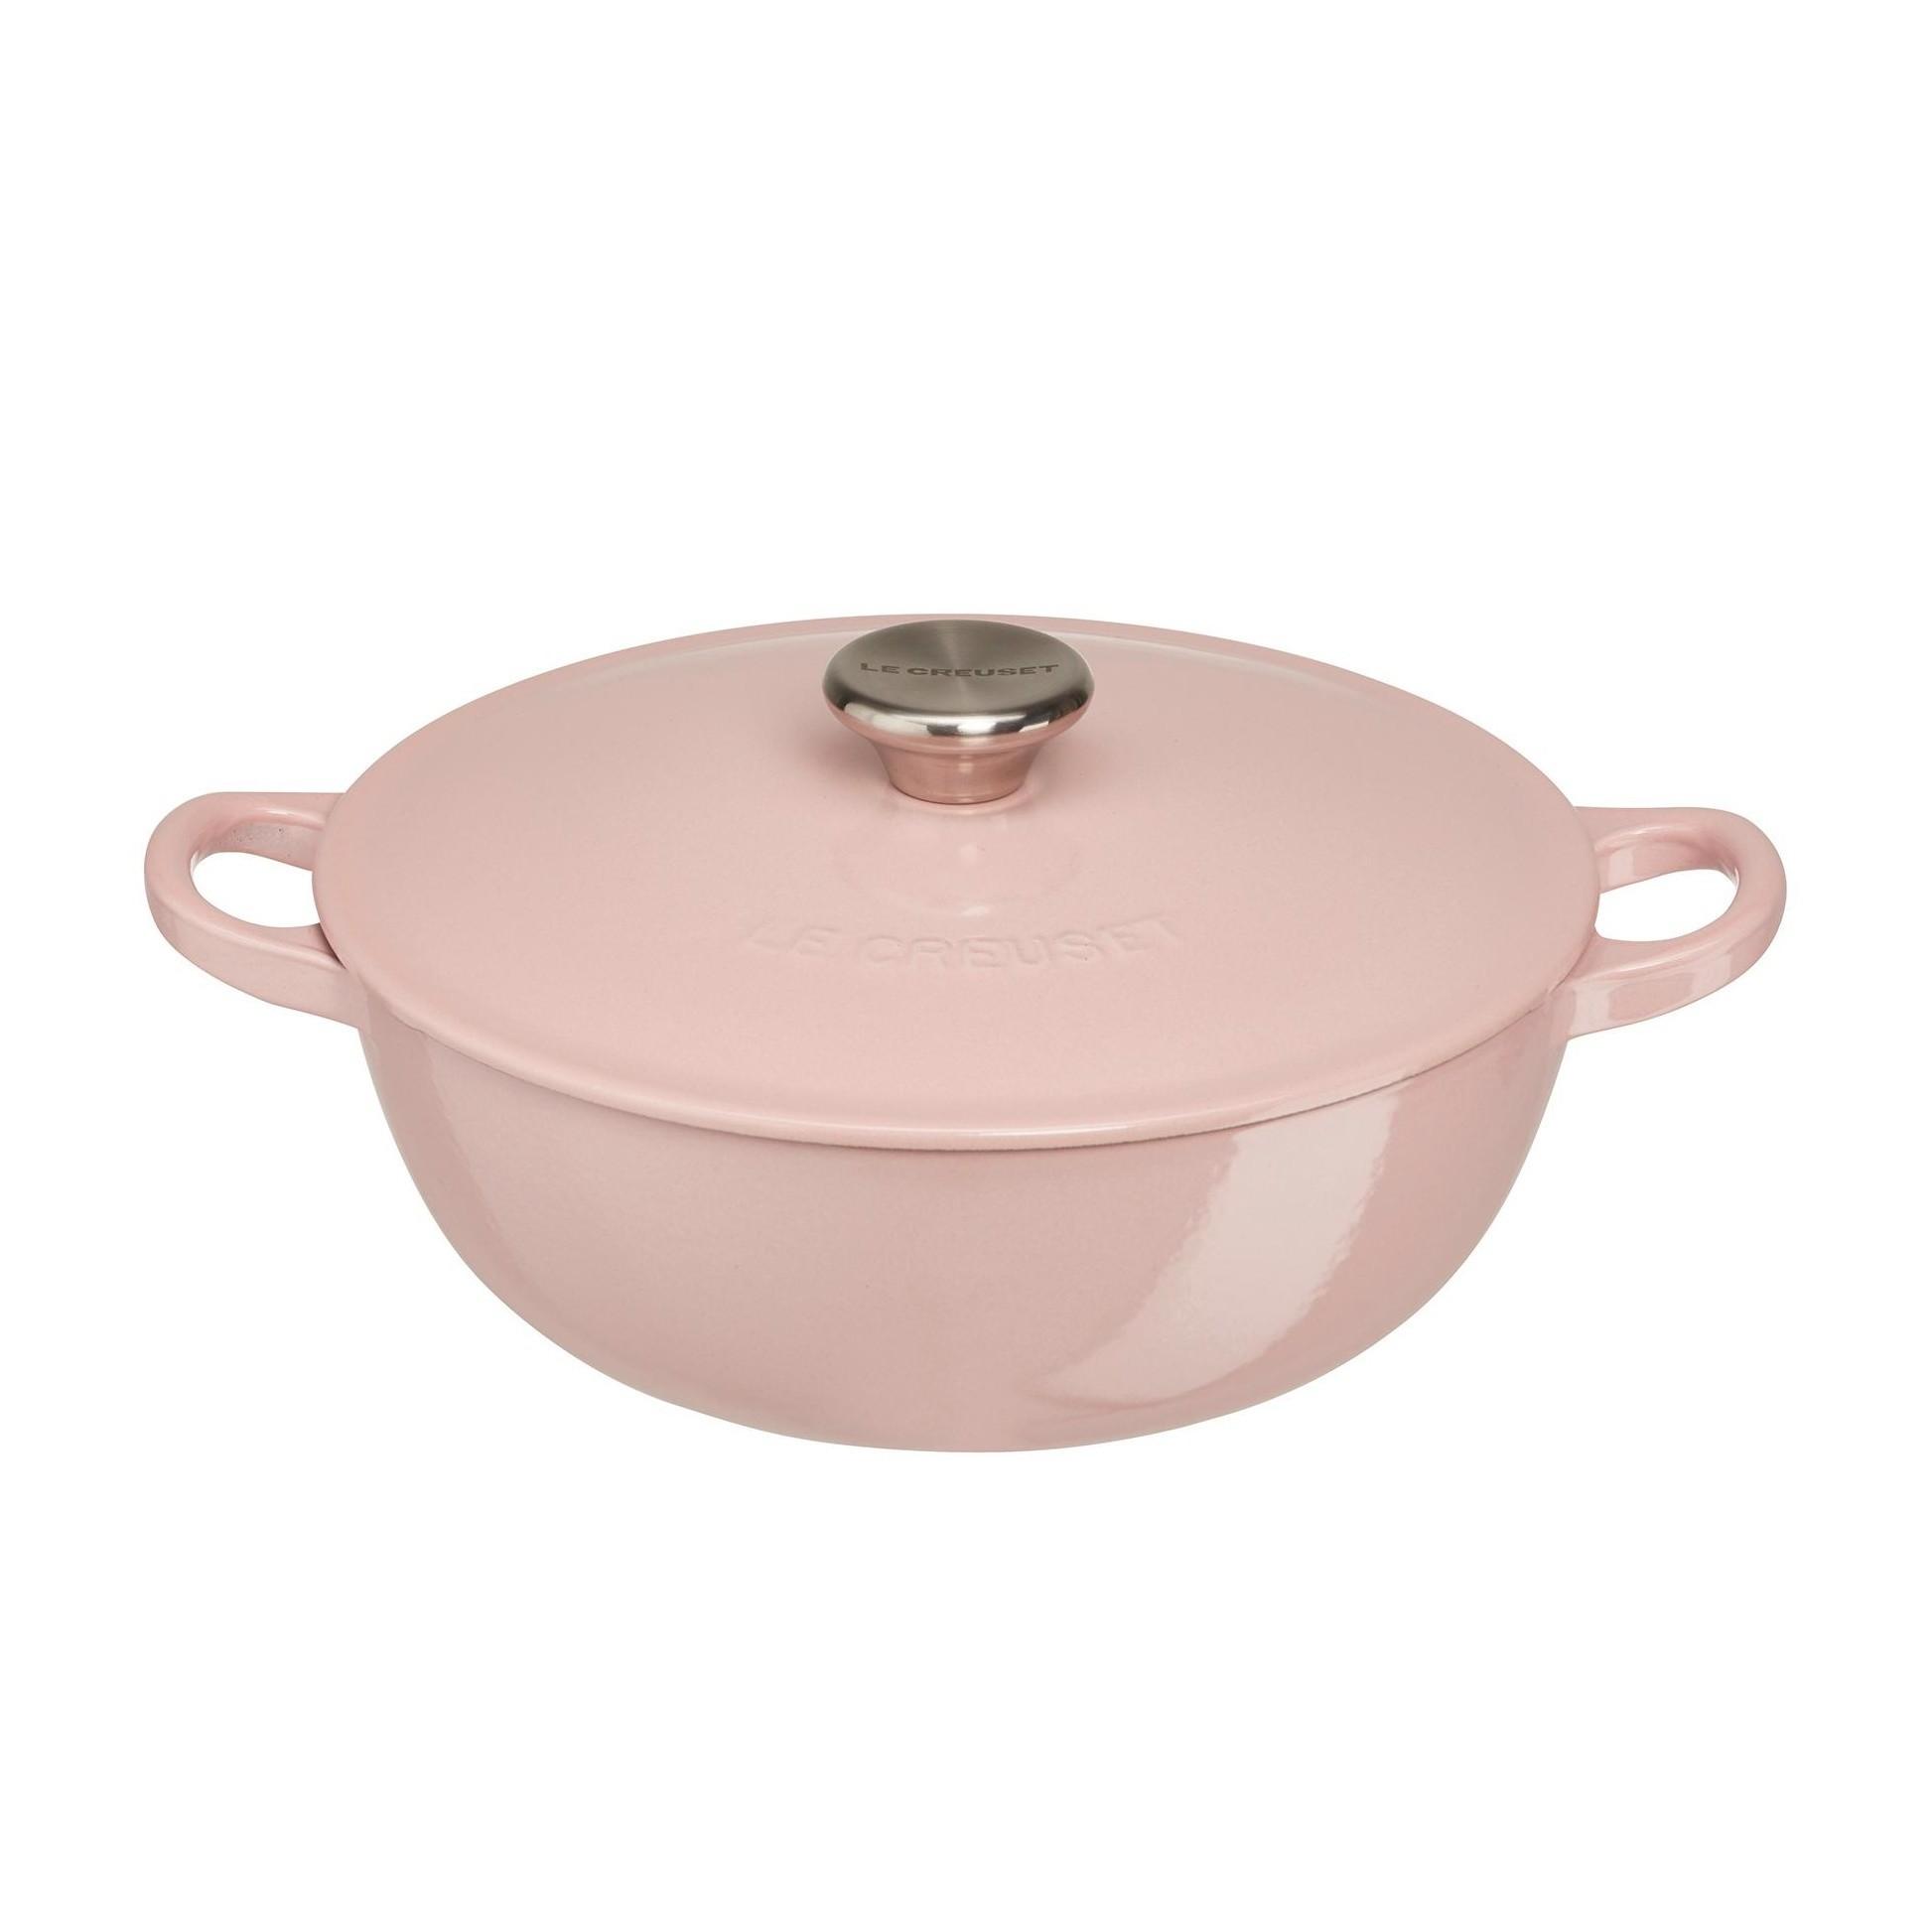 Le Creuset Limited Edition La Marmite Family Cooking Pot Pink